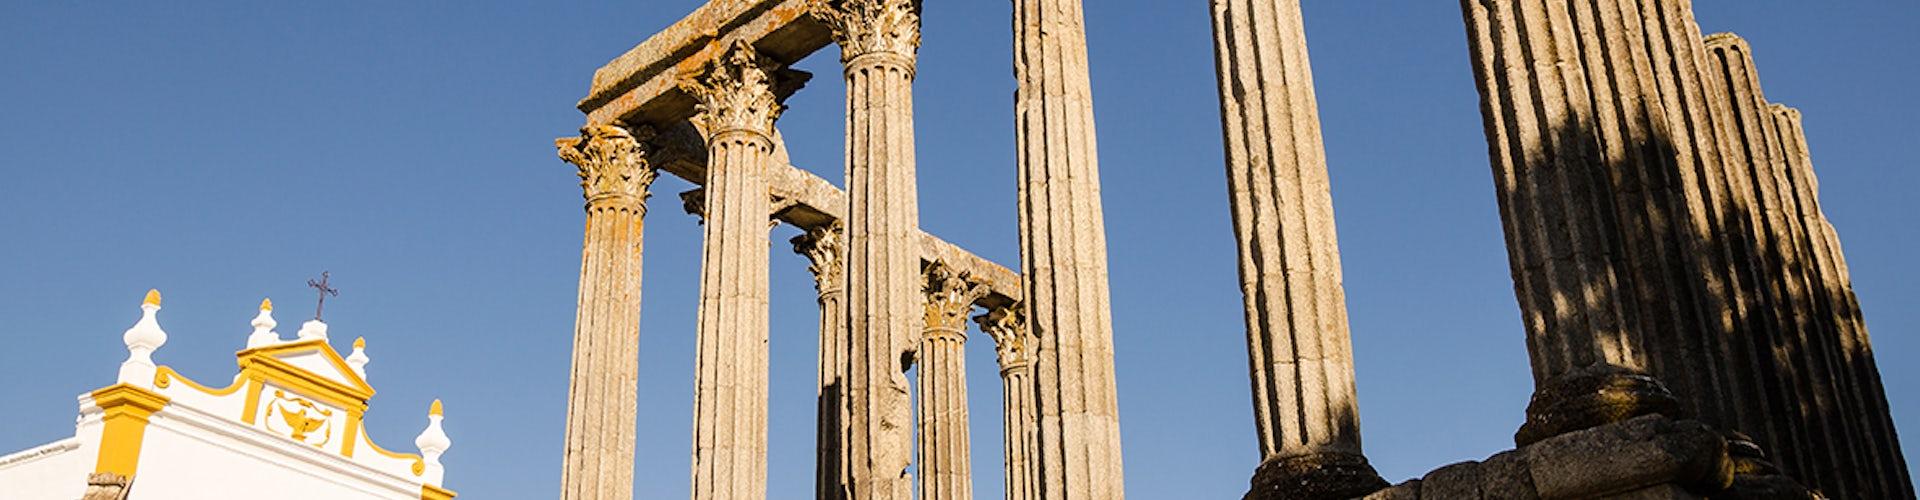 Templo Romano de de Diana en Évora